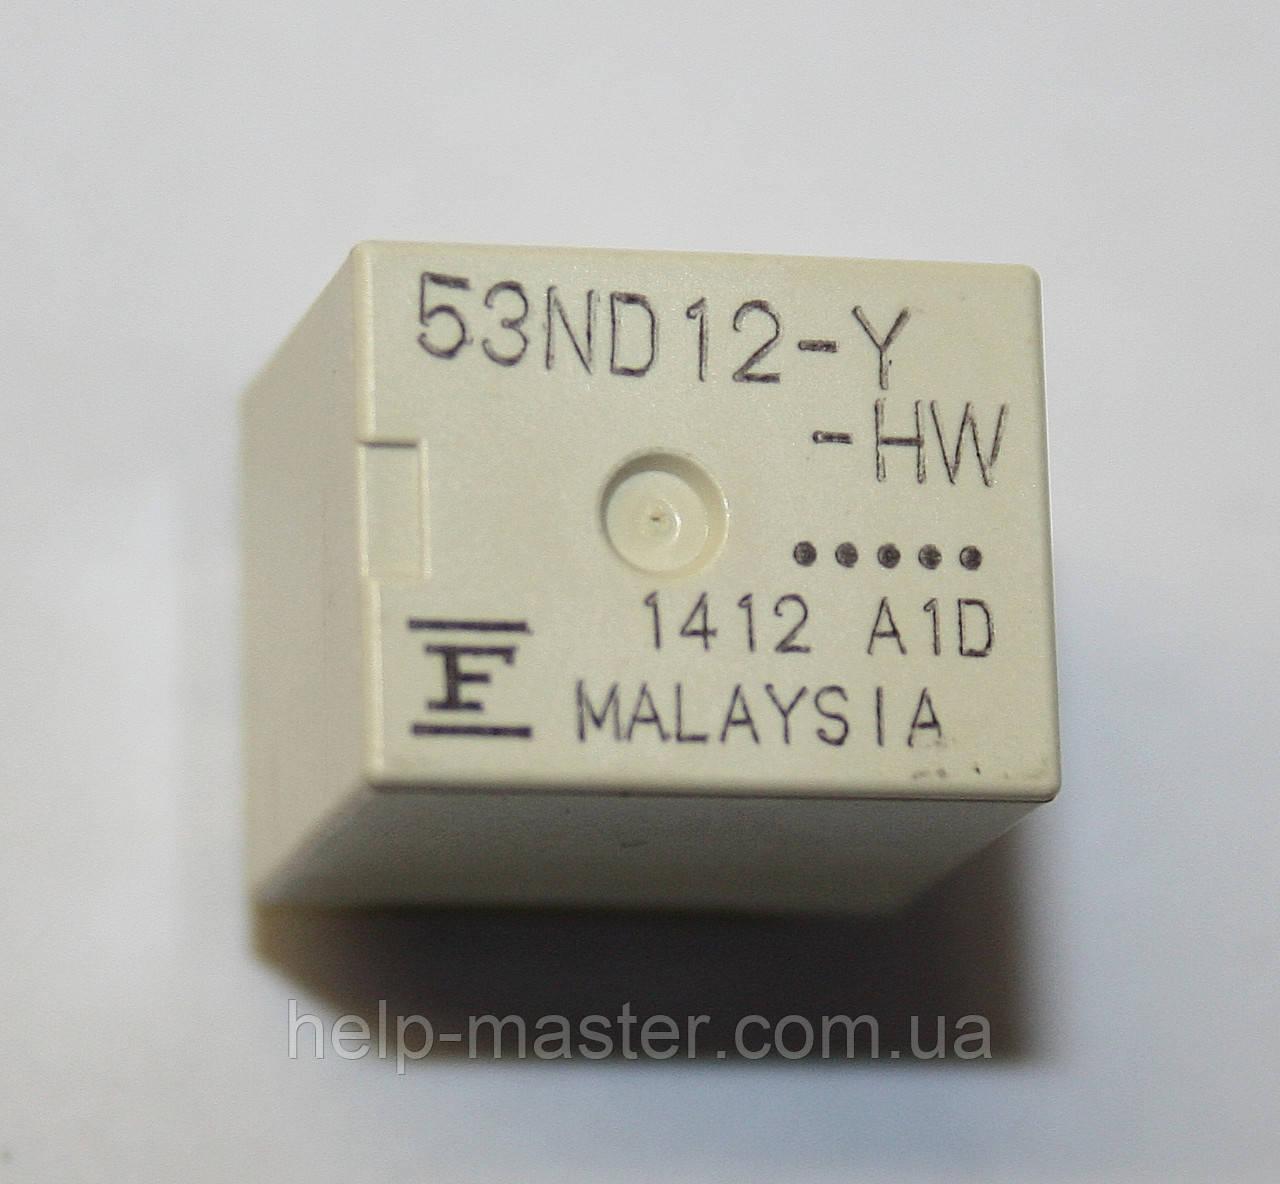 Реле 53ND12-Y-HW (12VDC)